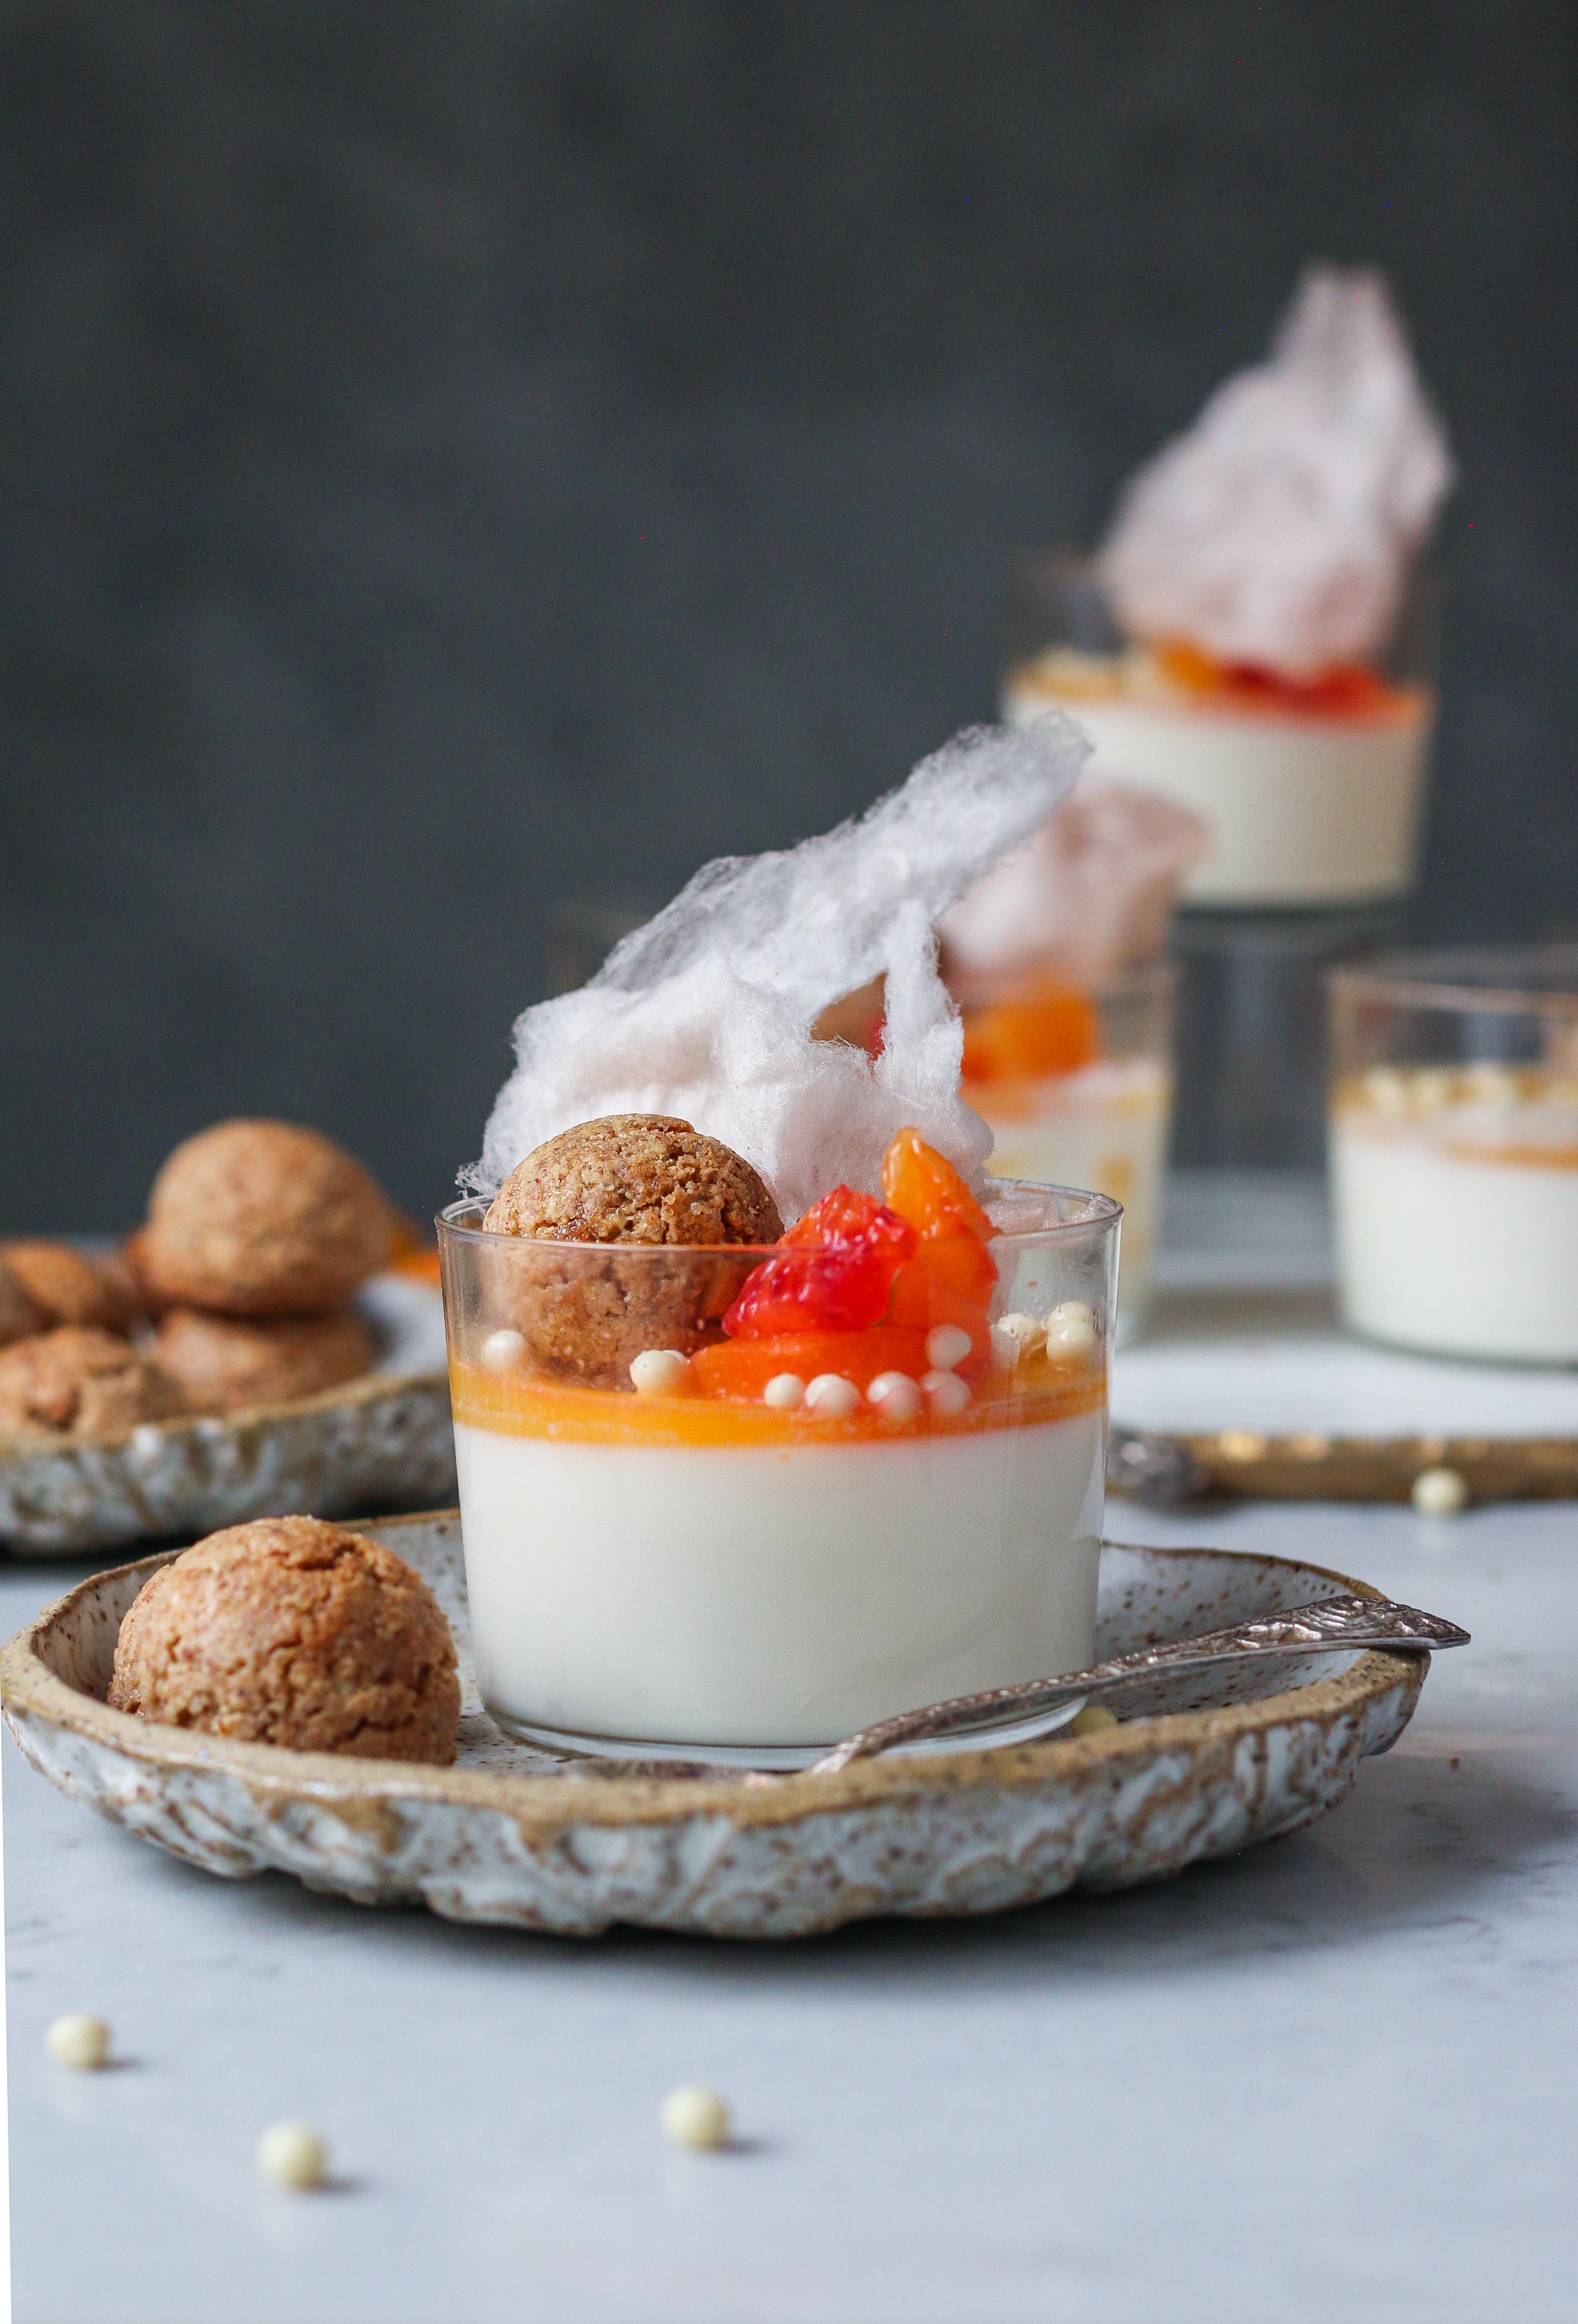 Baileys White chocolate panna cotta with Amaretti cookies |foodfashionparty| #valentinesdessert #bloodorangedessert